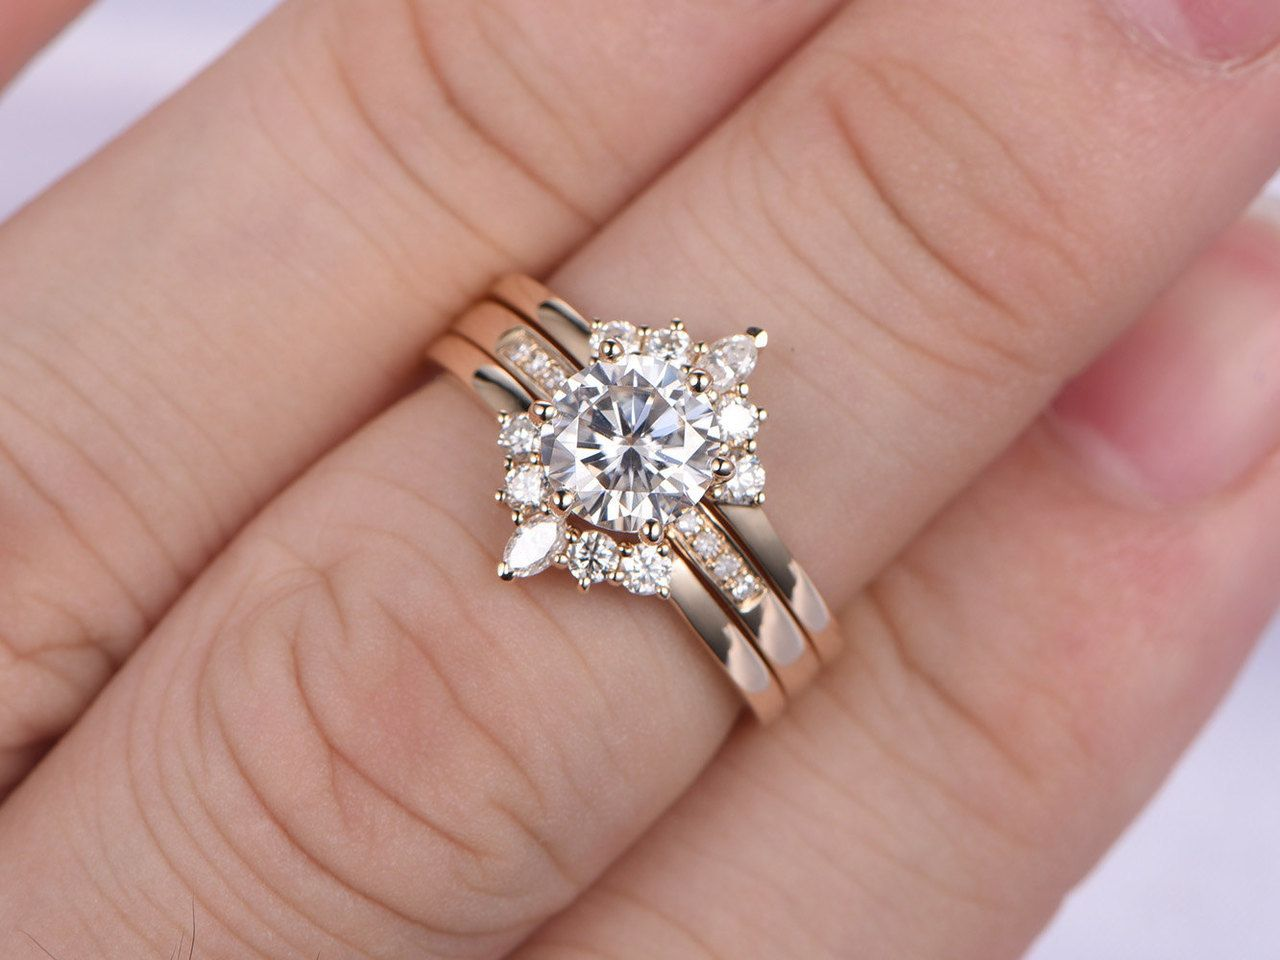 3pcs Moissanite Engagement ring set,6.5mm Round Moissanite Ring,2pcs ...